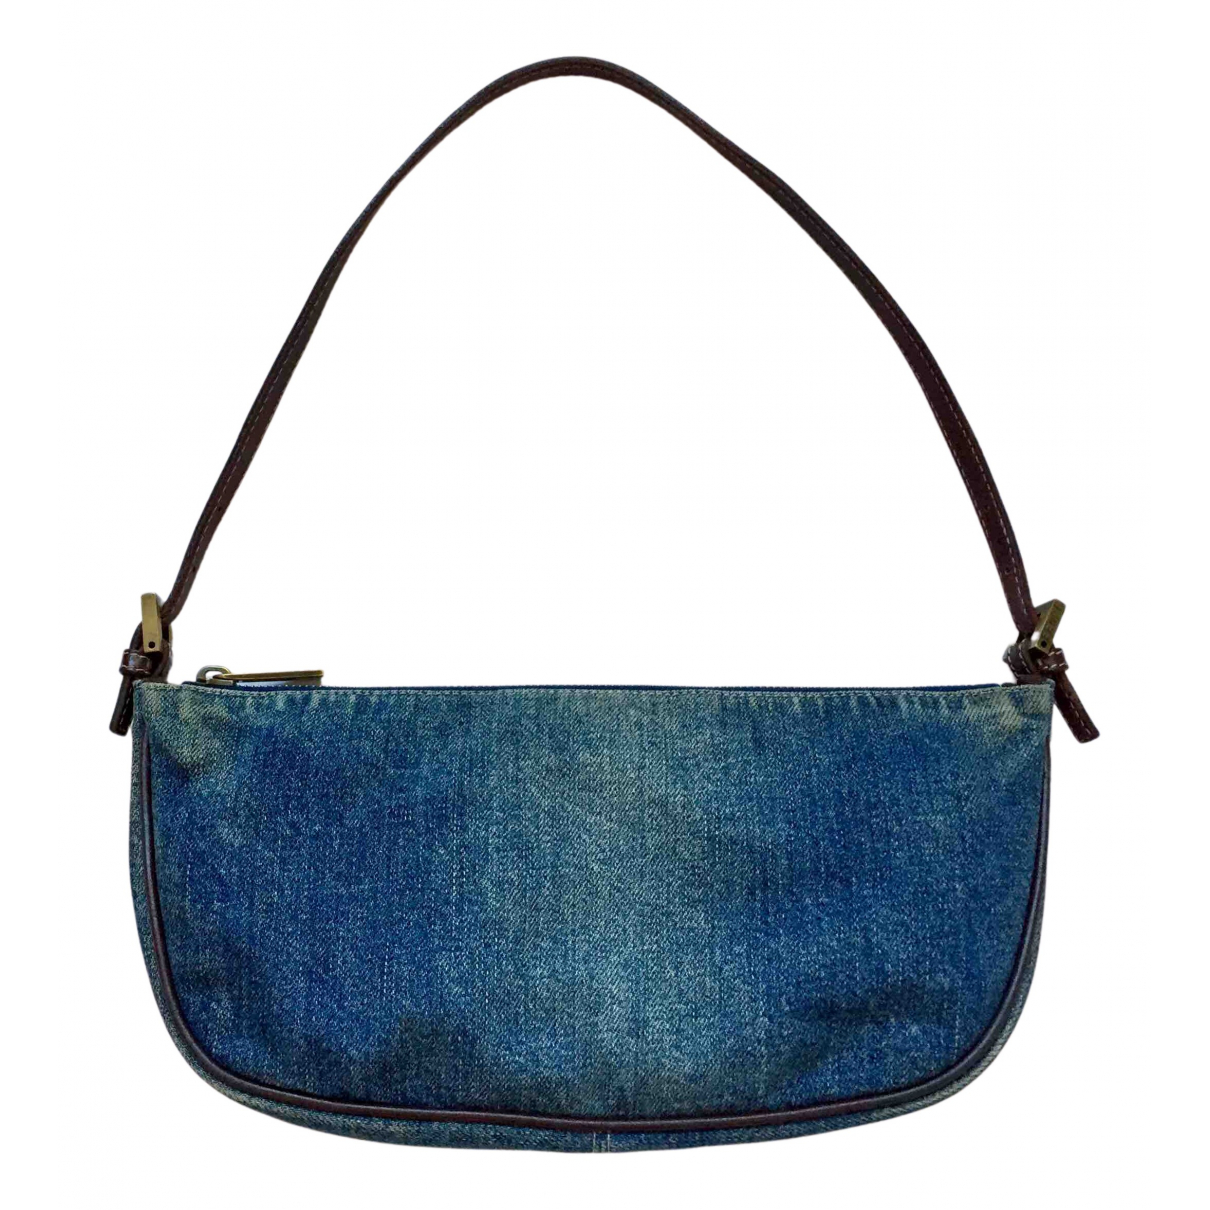 Fendi \N Clutch in  Blau Denim - Jeans